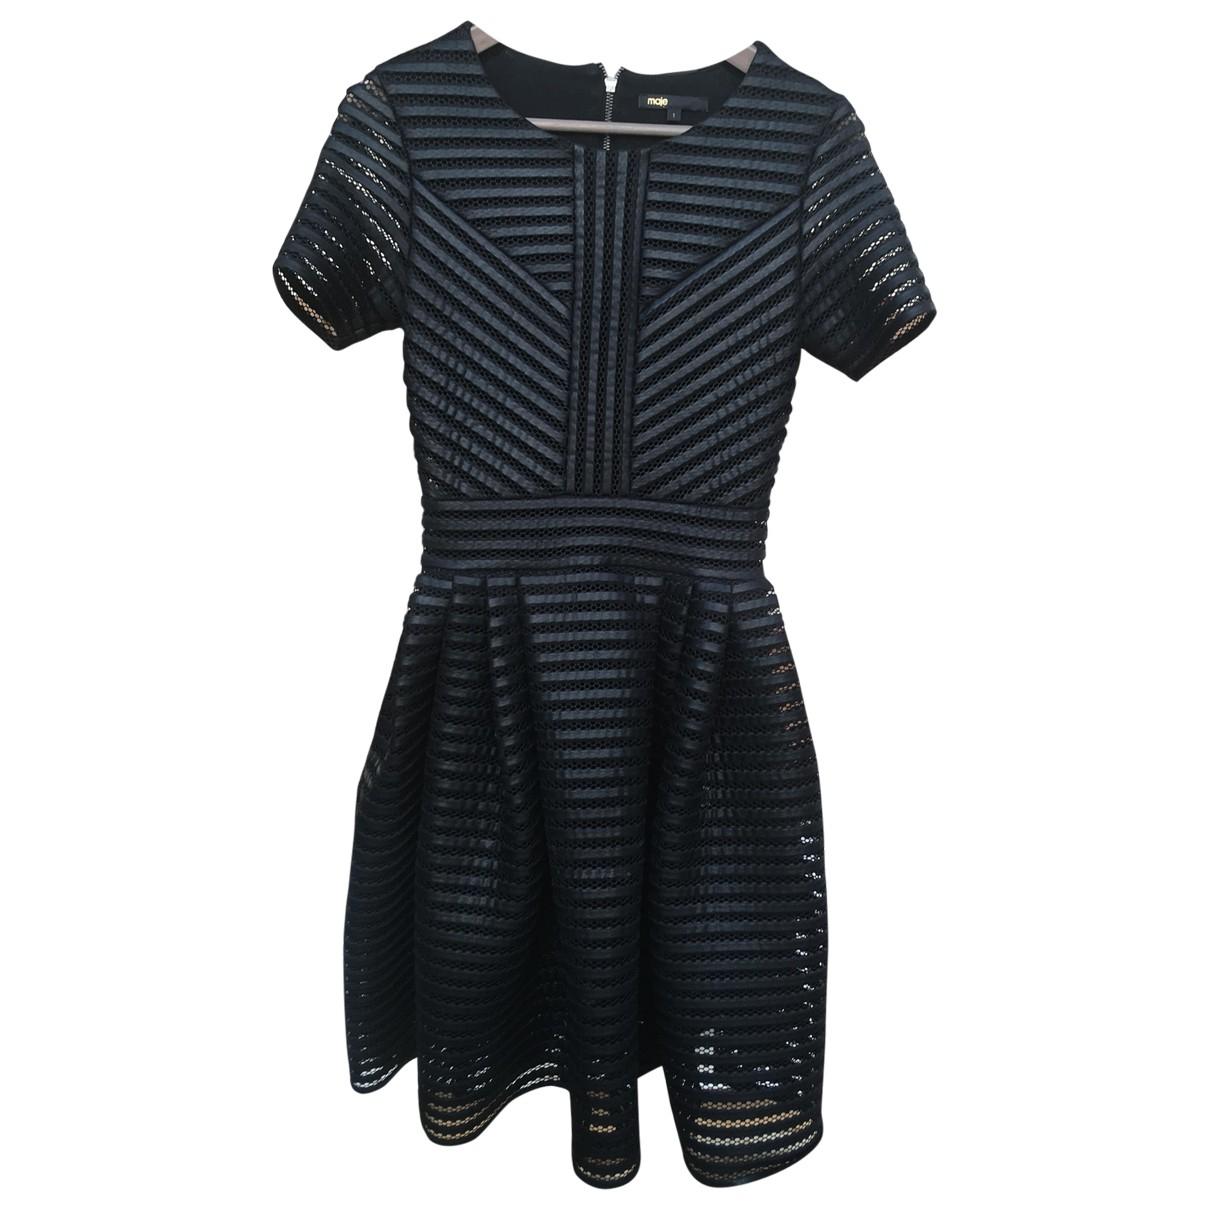 Maje \N Black Leather dress for Women 36 FR